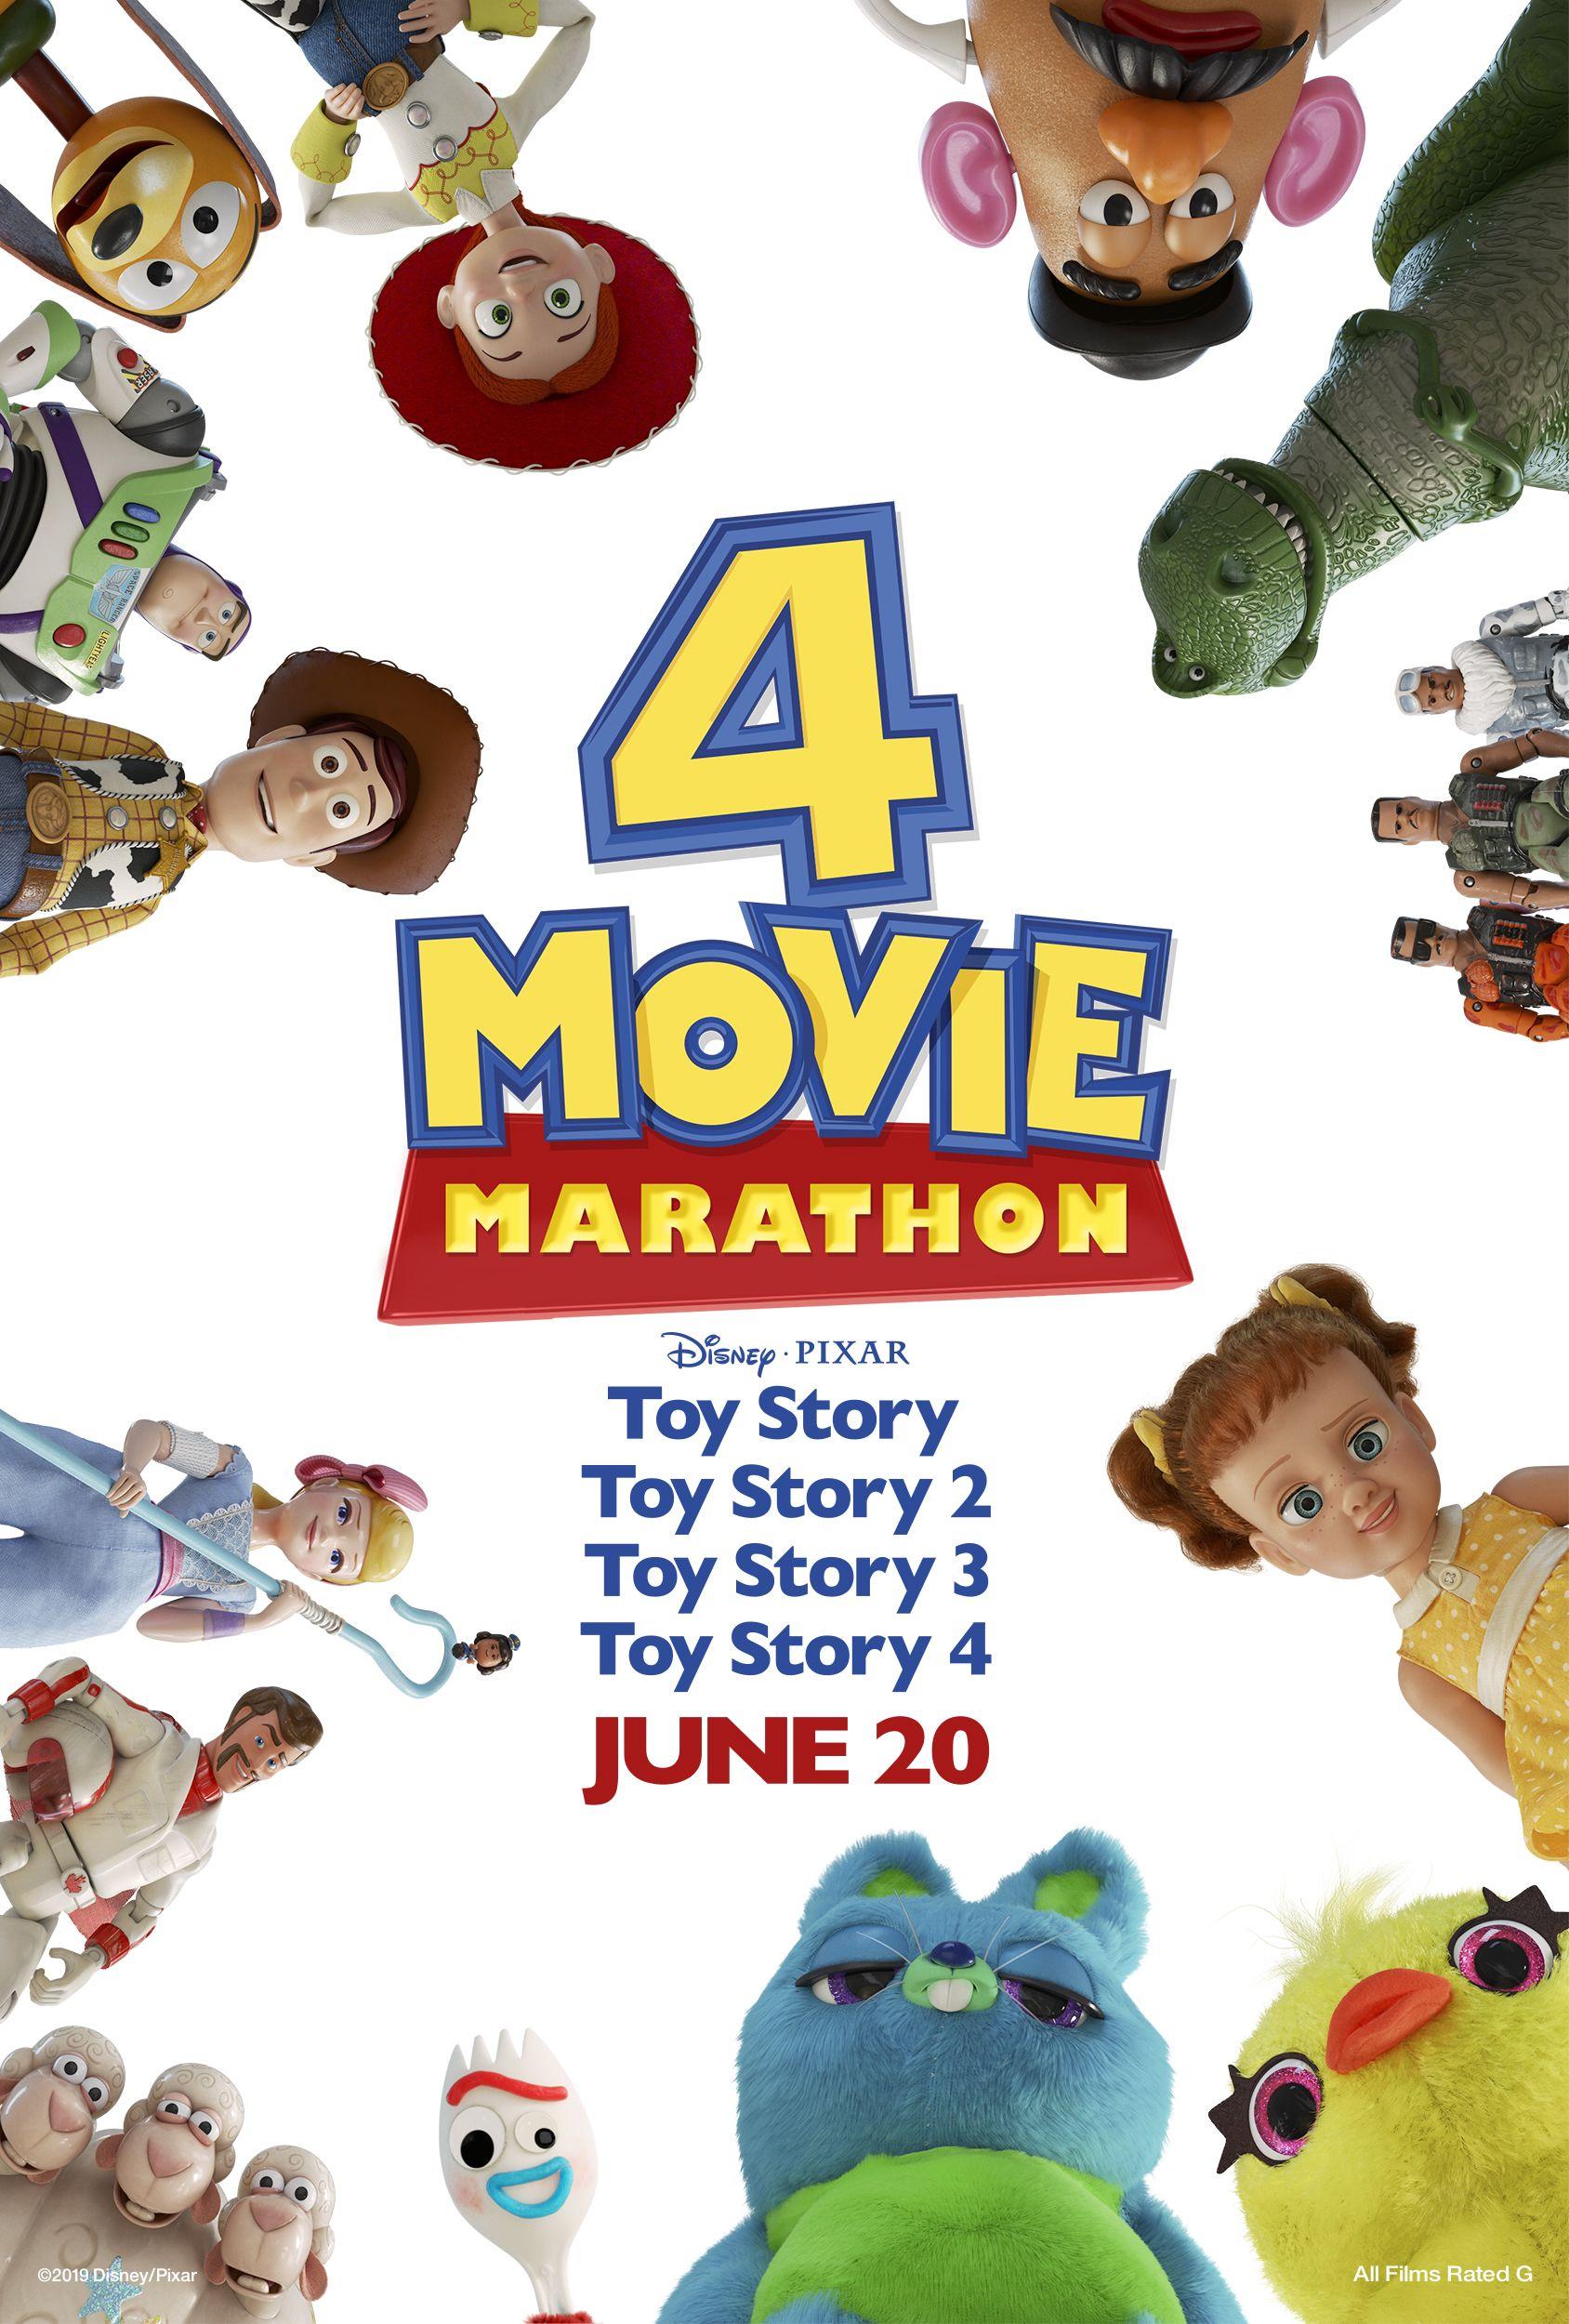 Omg Toy Story 4 Movie Marathon At An Amc Theatre Near You Movie Marathon Toy Story Pixar Toys